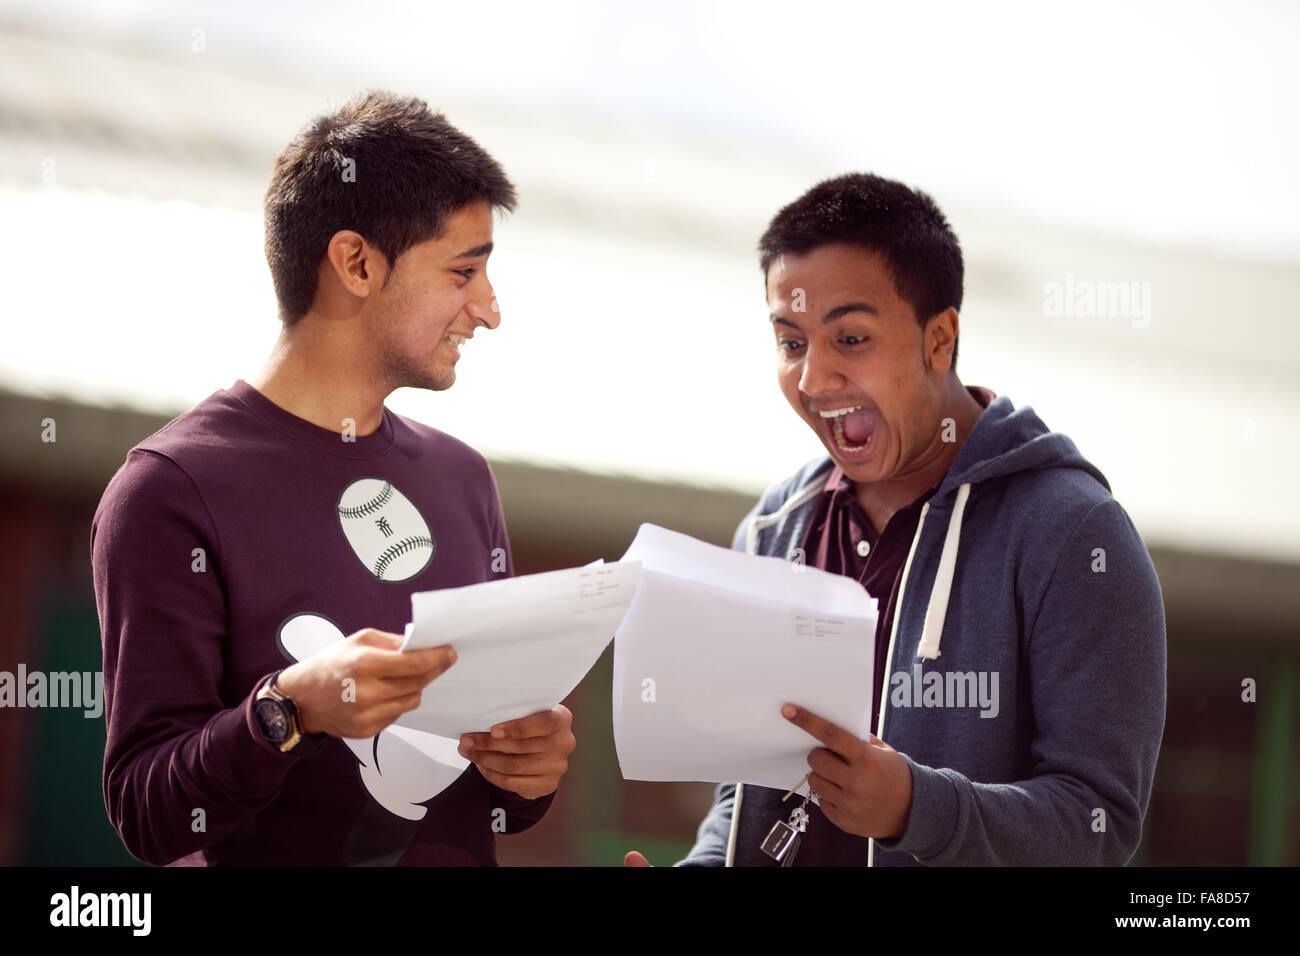 GCSE führt an Stretford High School, Stretford, Manchester. Stockbild